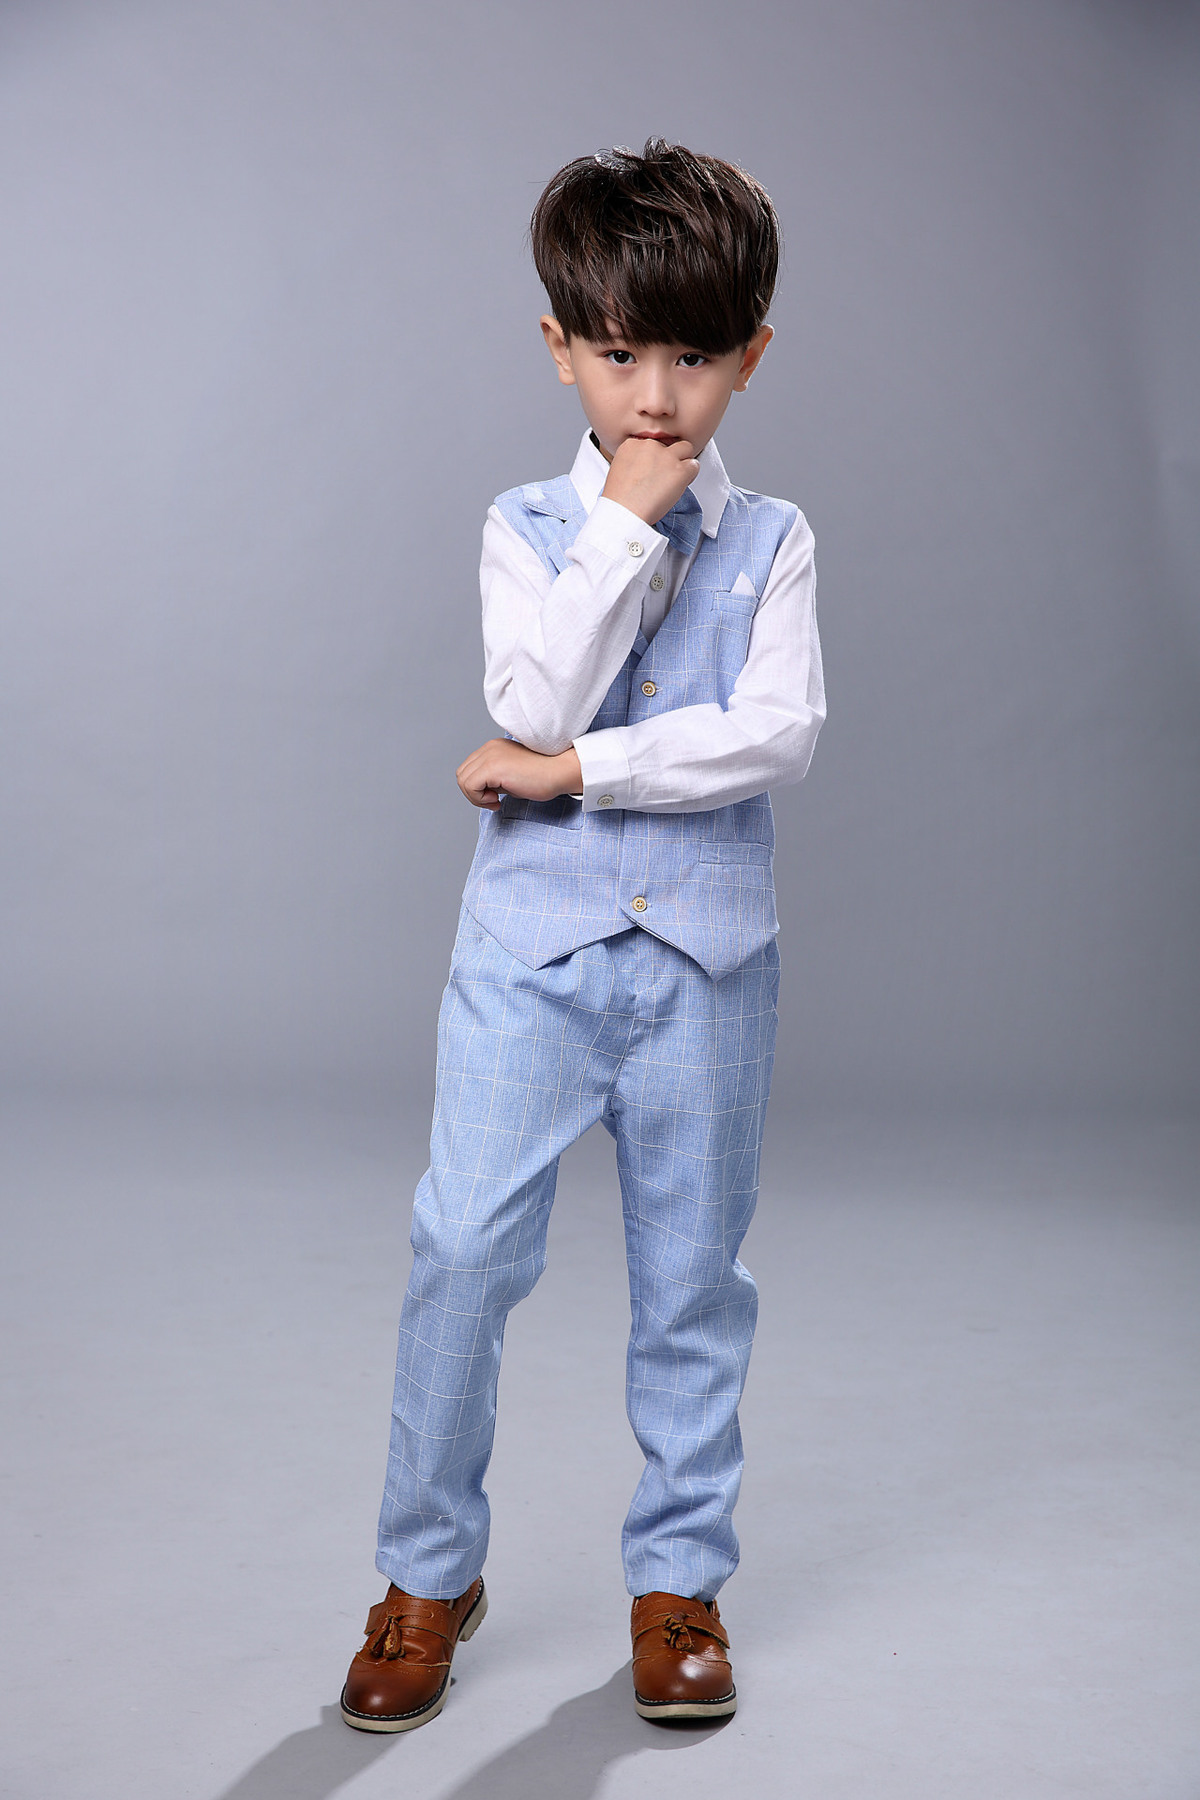 Kids sets for Boys Formal Suits Birthday Wedding Party Dress Shirt Gentleman Waistcoat Vest Pants Korean Style Children Clothes Y1893005